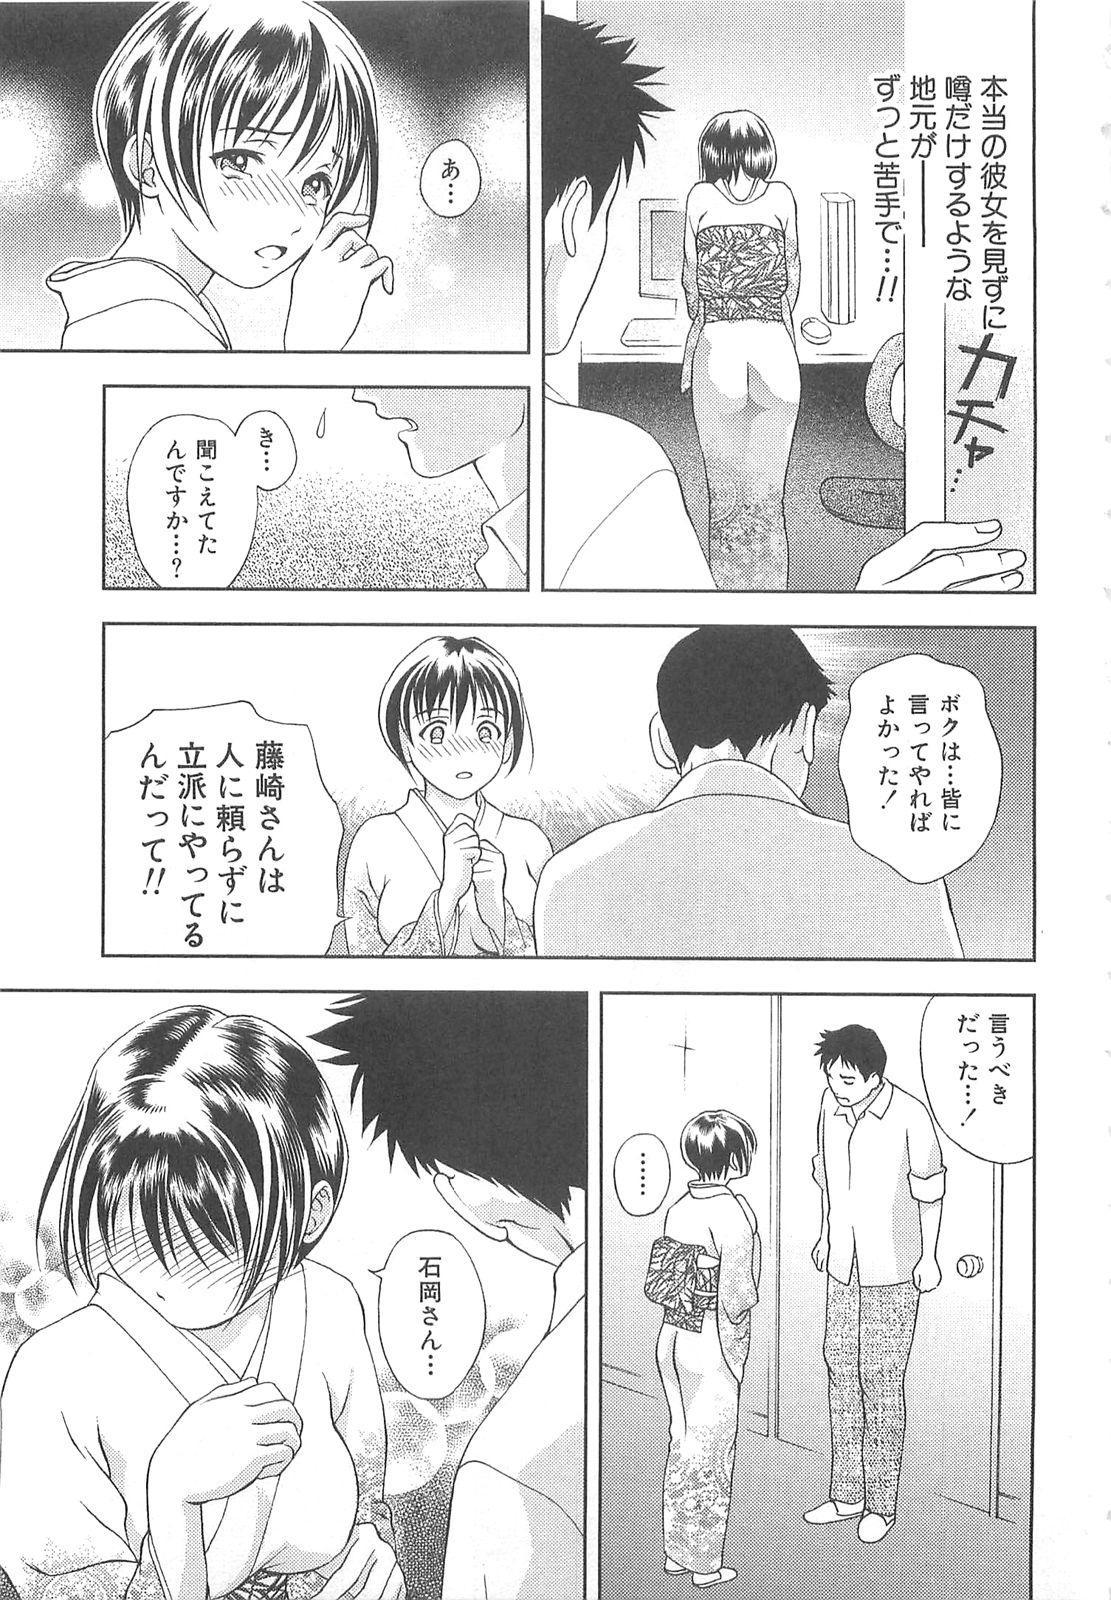 Tenshi no Kyuu - Angel's Pretty Hip 115